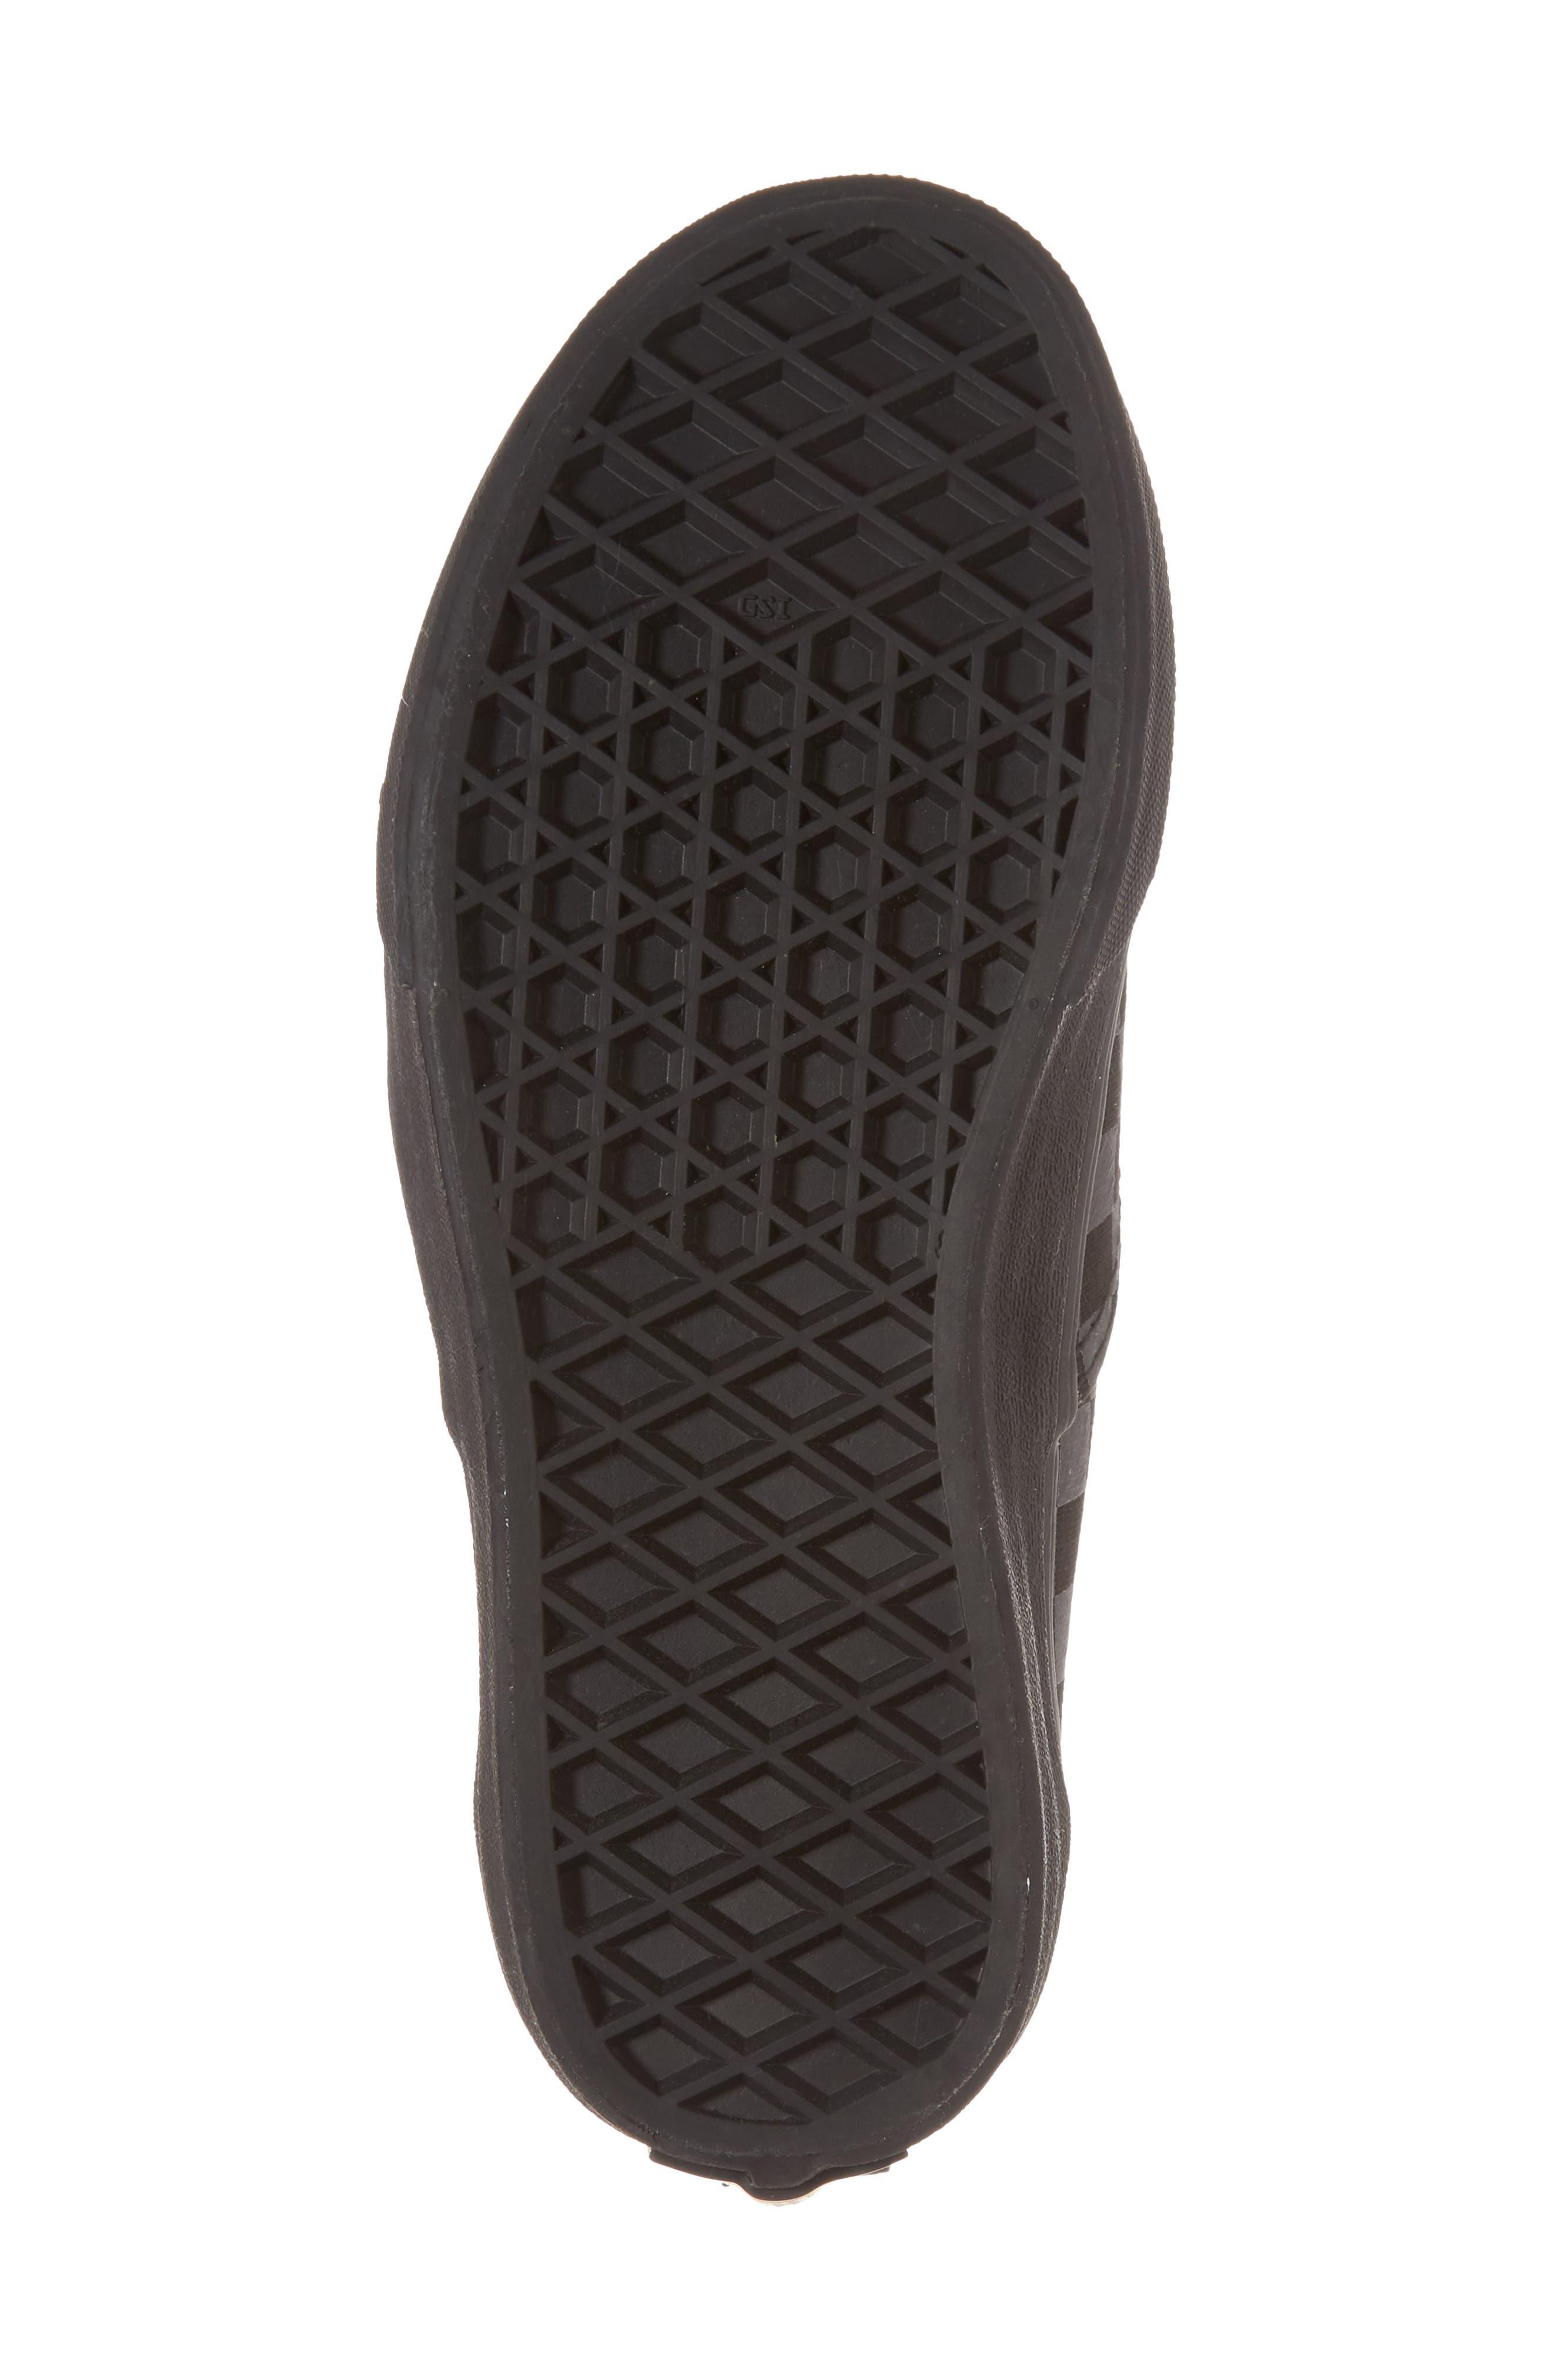 Reflective Checkerboard Authentic Sneaker,                             Alternate thumbnail 6, color,                             Asphalt/ Reflective